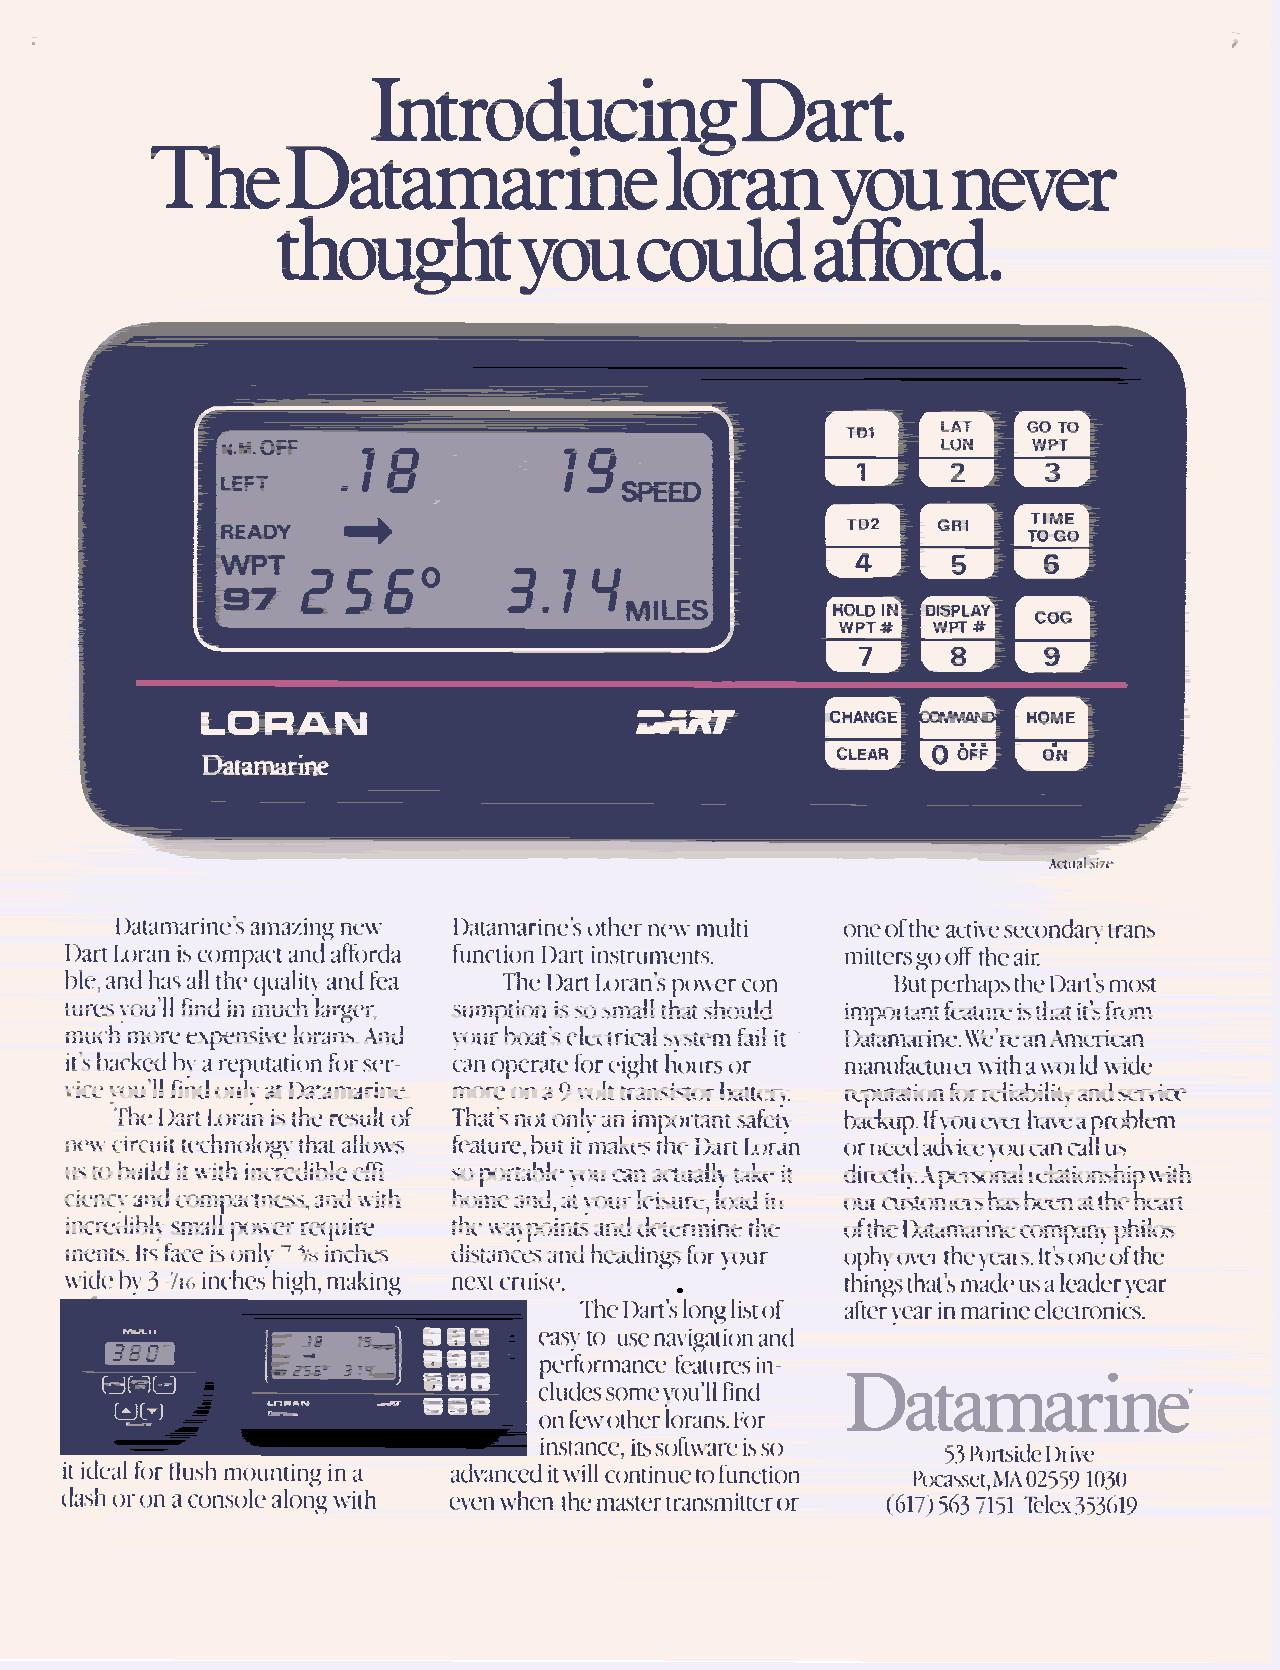 Datamarine Dart – Loran system